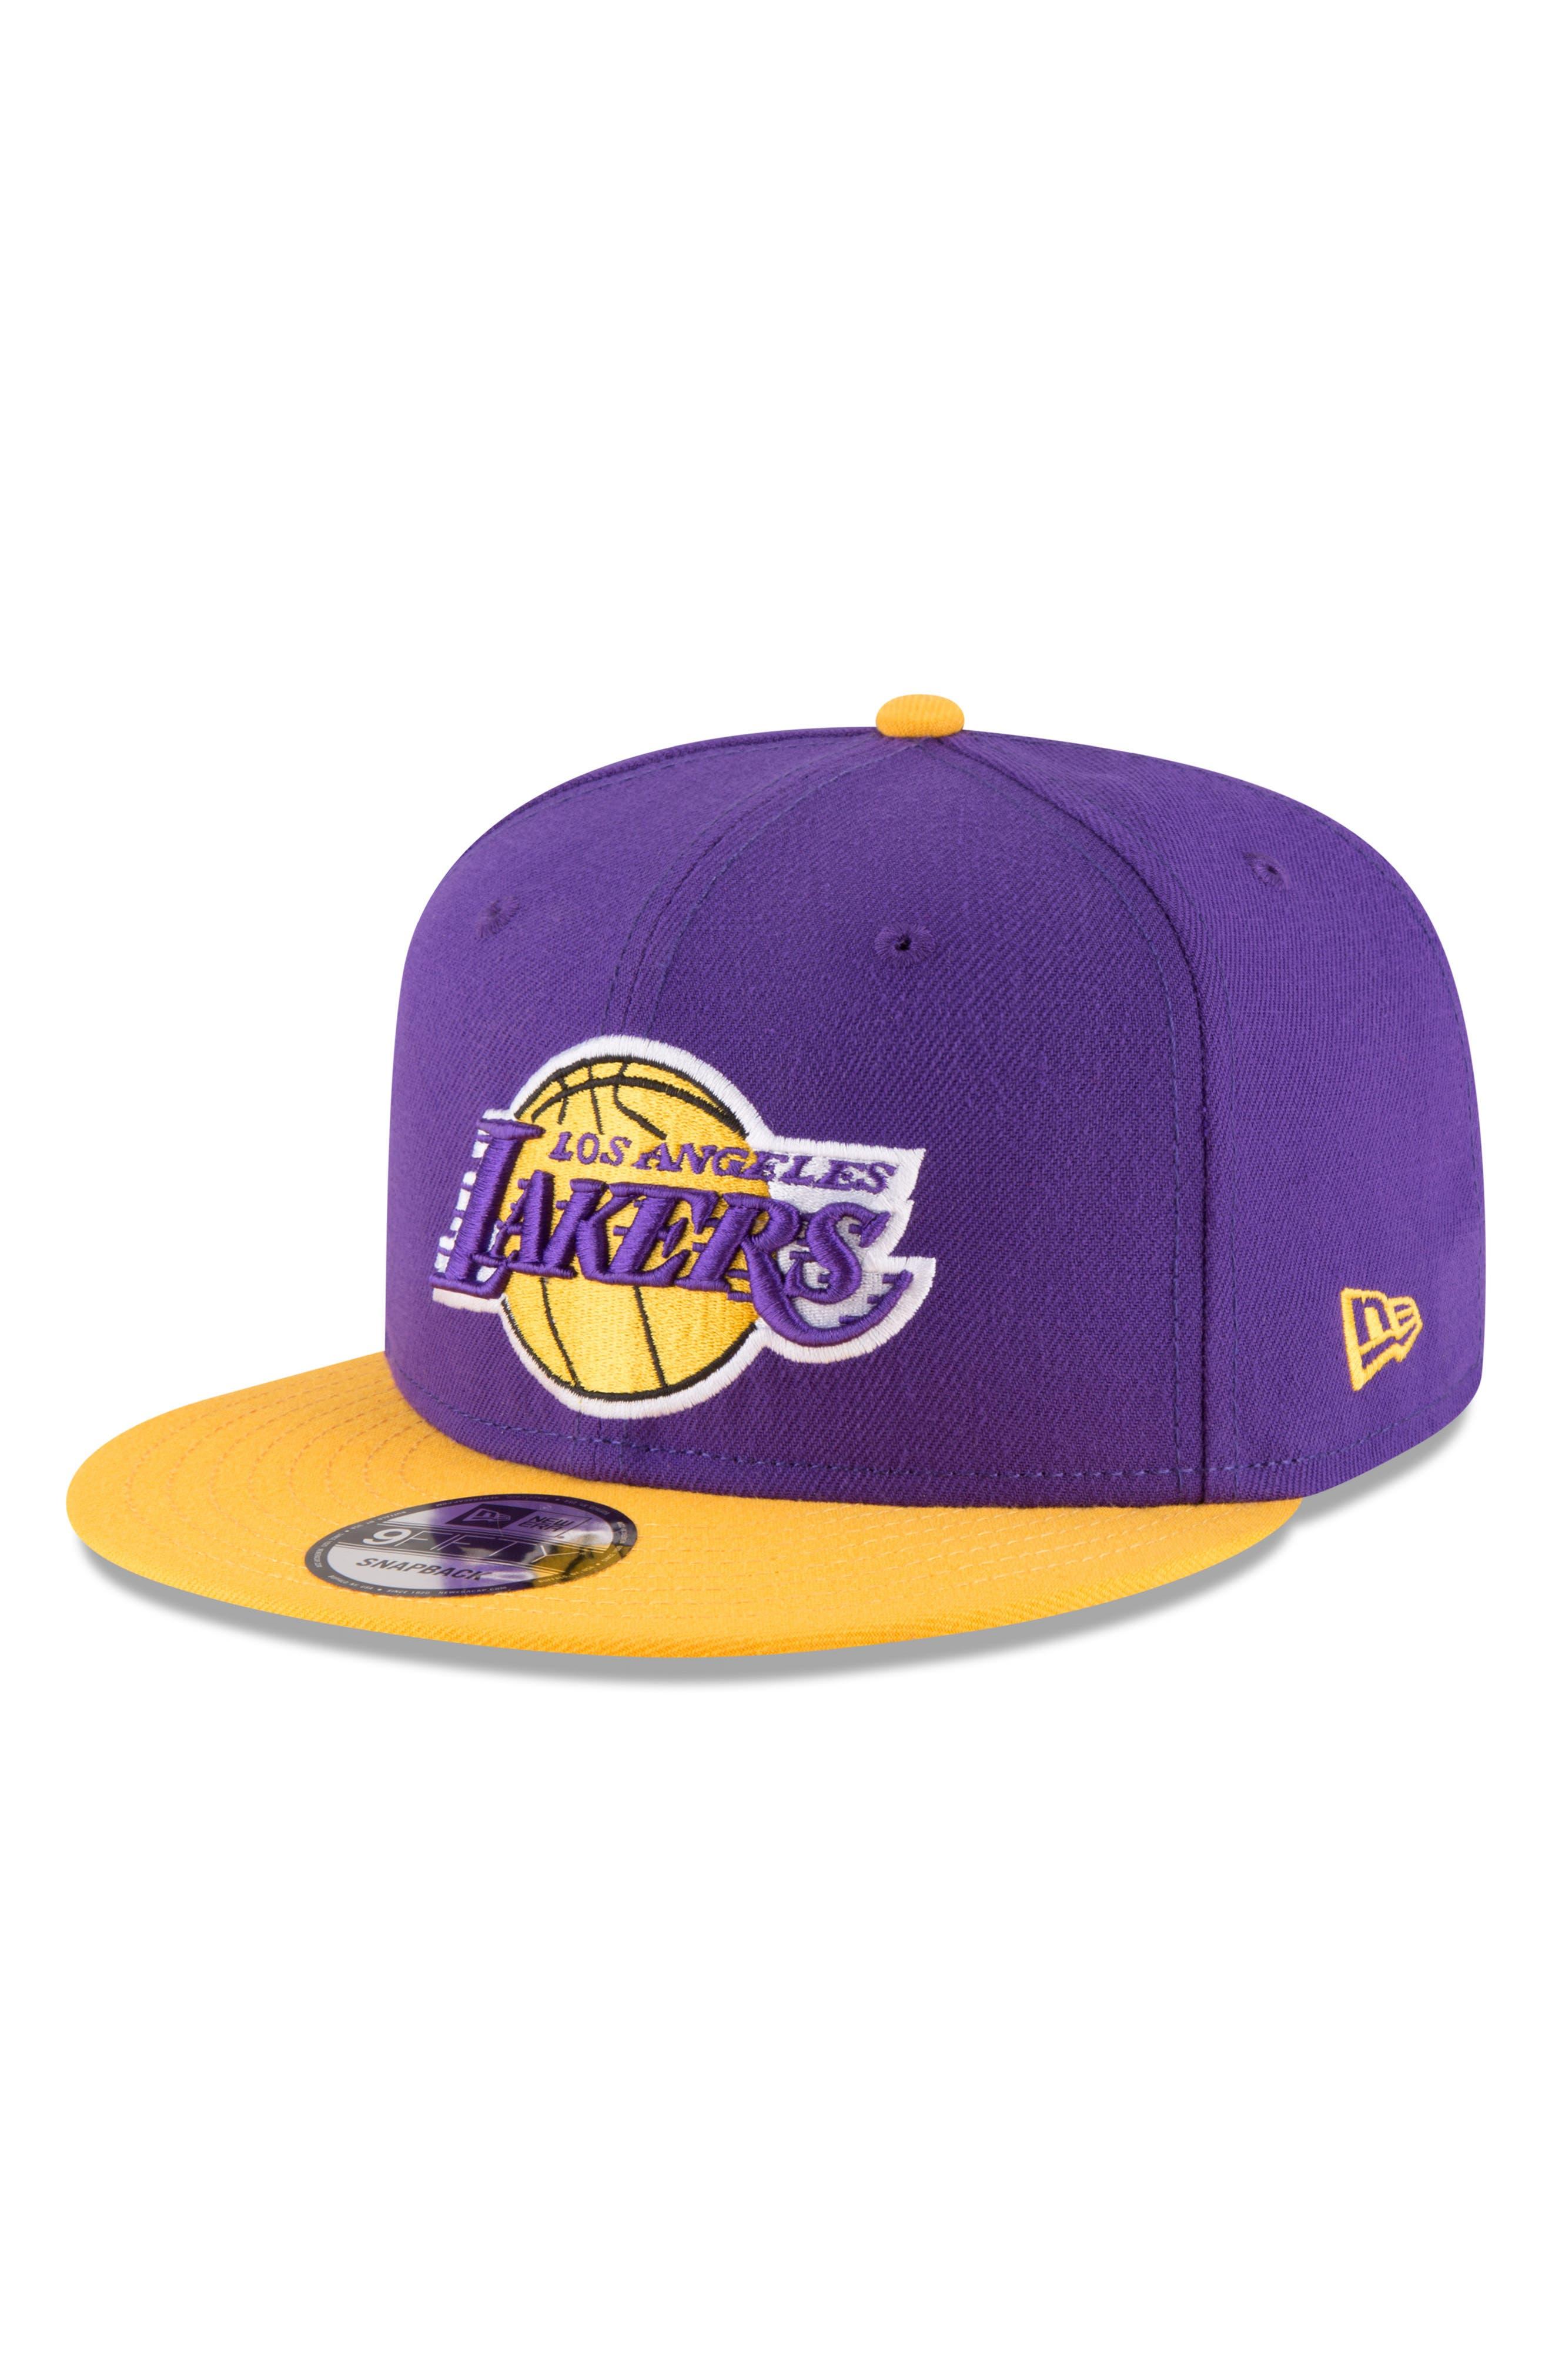 9FIFTY LA Lakers Two-Tone Cap,                             Main thumbnail 1, color,                             PURPLE